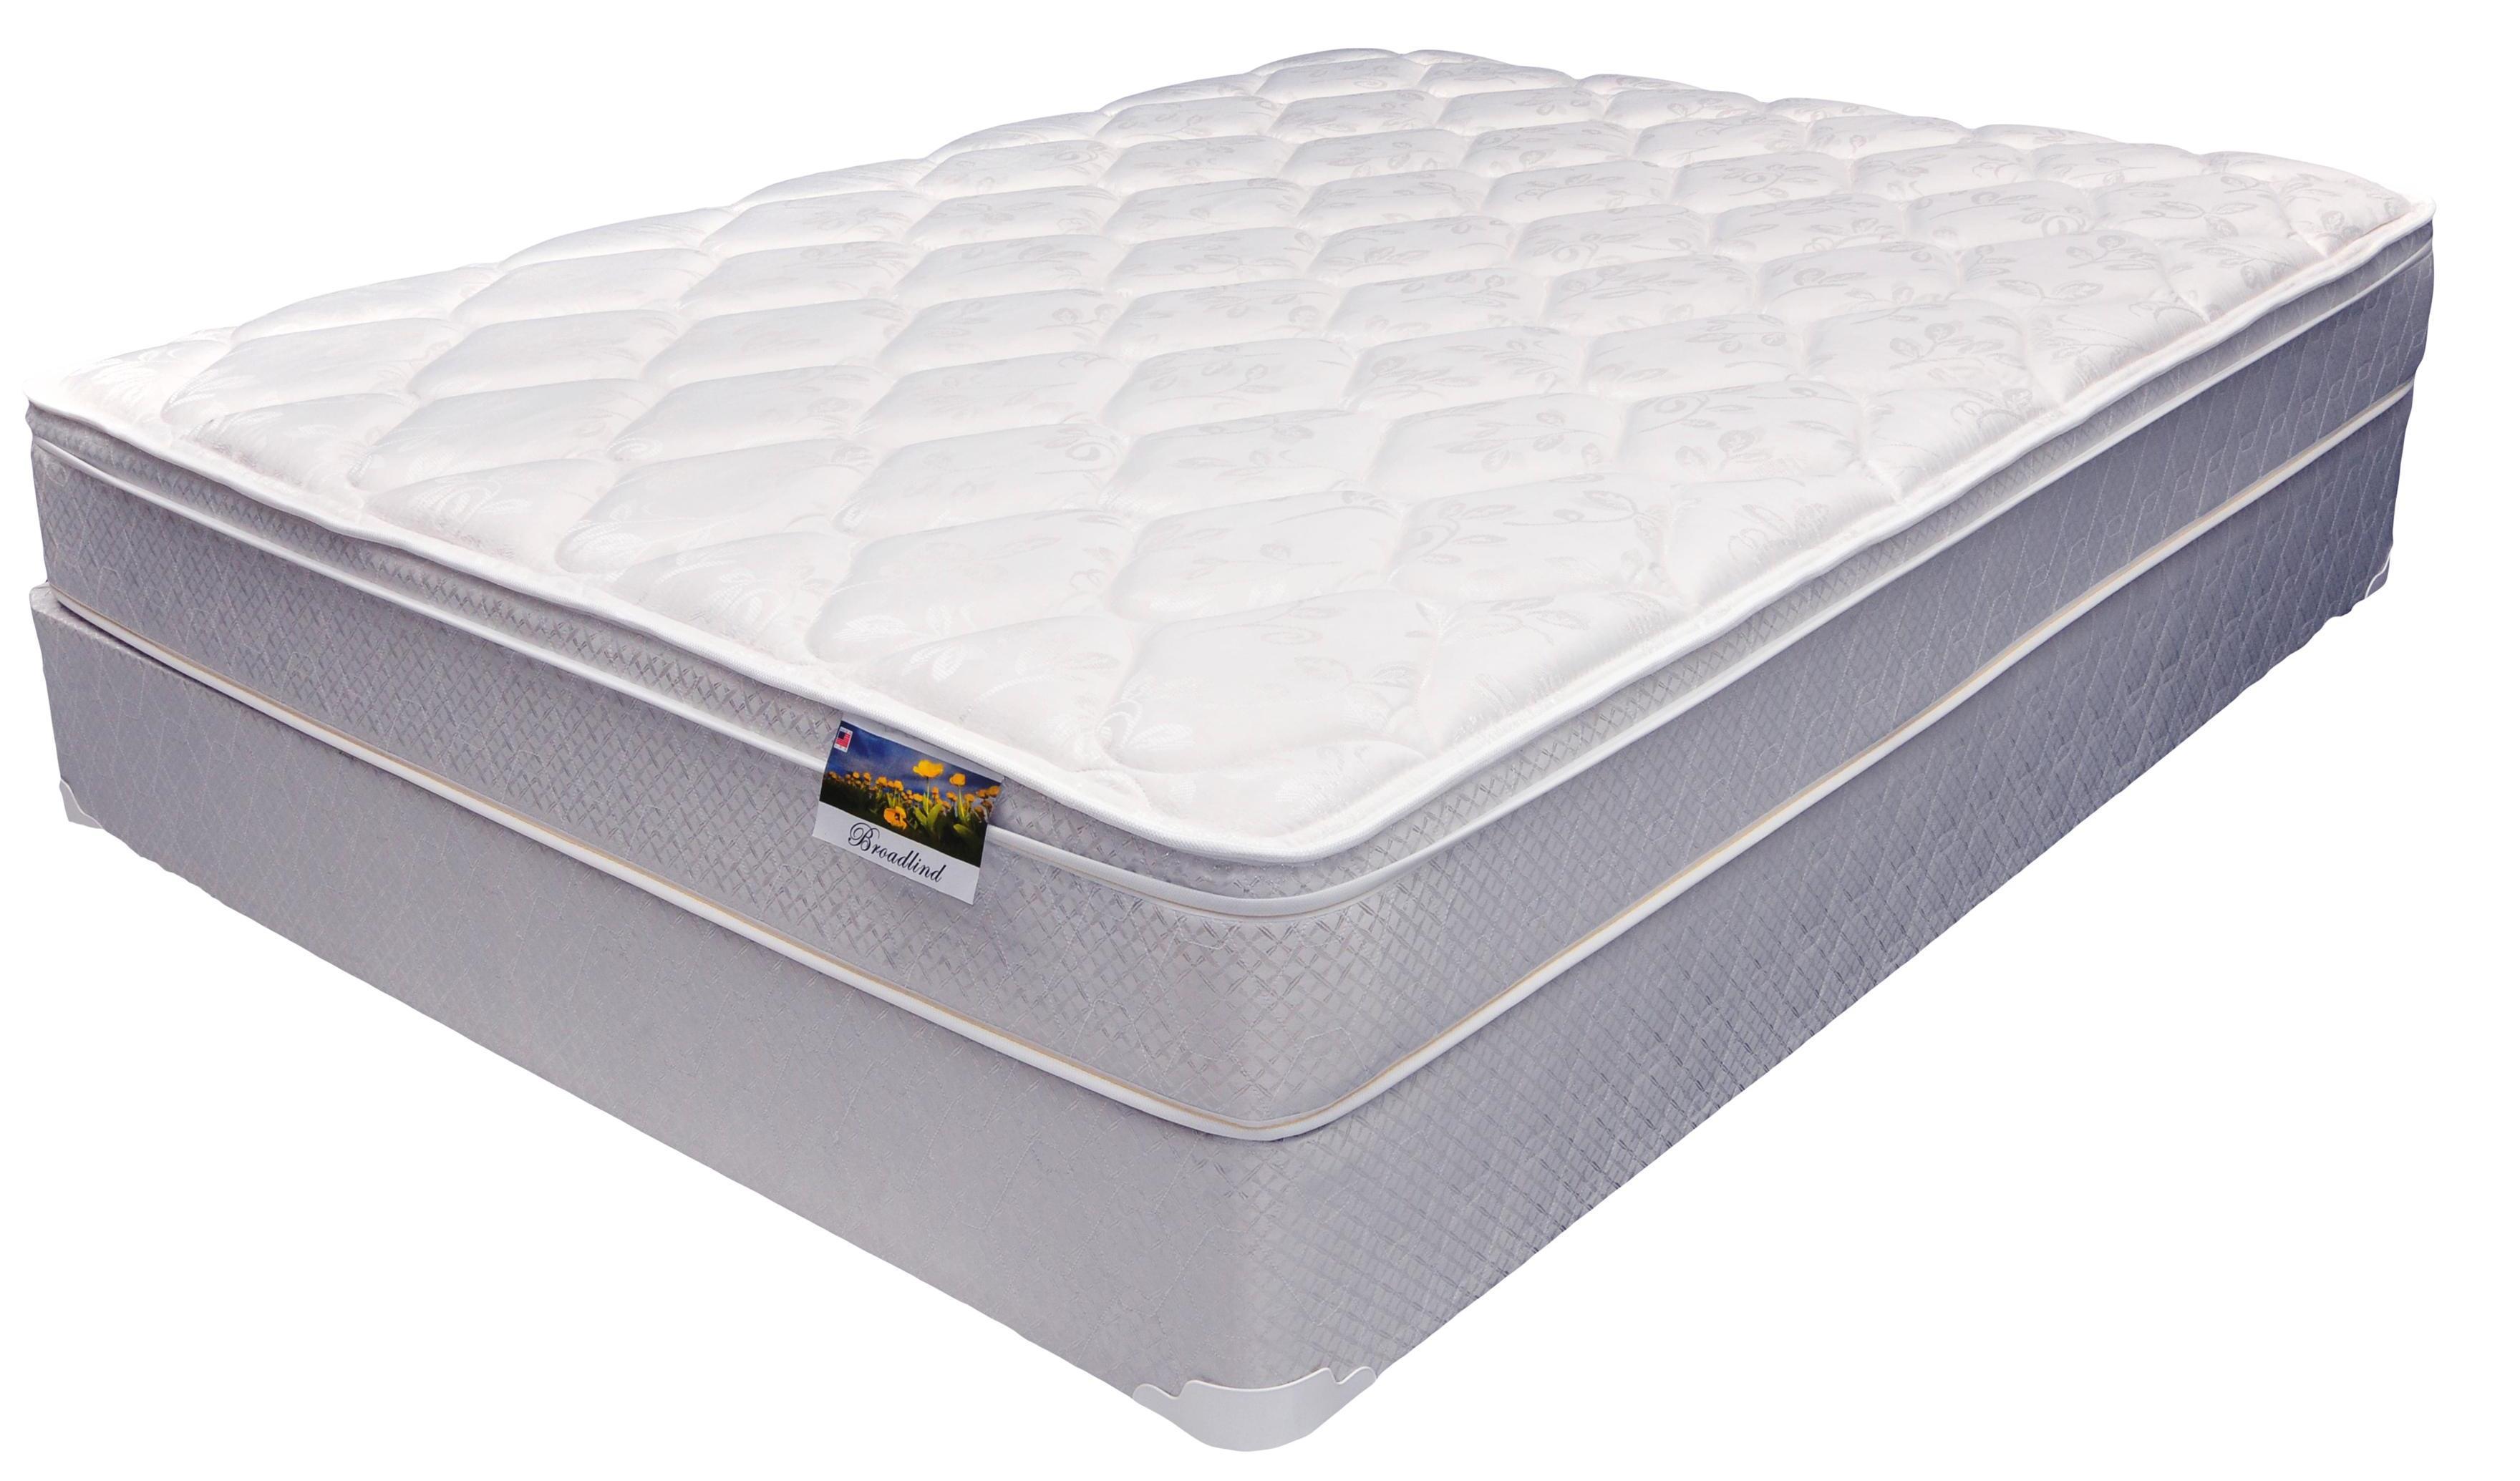 corsicana broadlind euro top broadlind euro top mattress full extra long l fish mattress. Black Bedroom Furniture Sets. Home Design Ideas